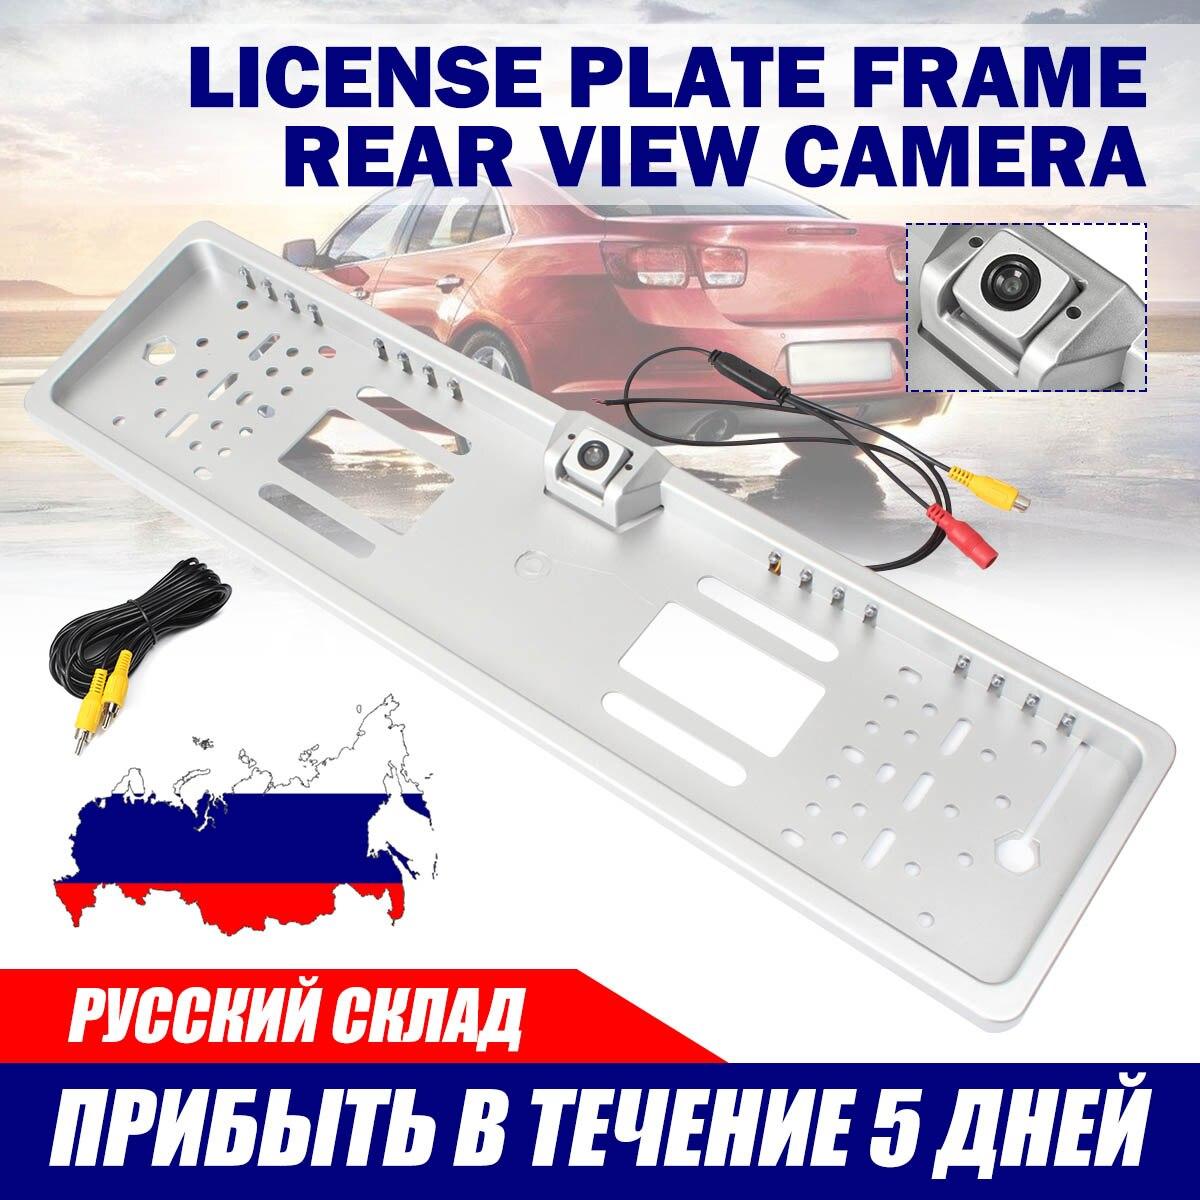 16 LED Car Rear View Camera EU European License Plate Frame Backup Parking Reverse Camera 170 Degree Waterproof Night Vision